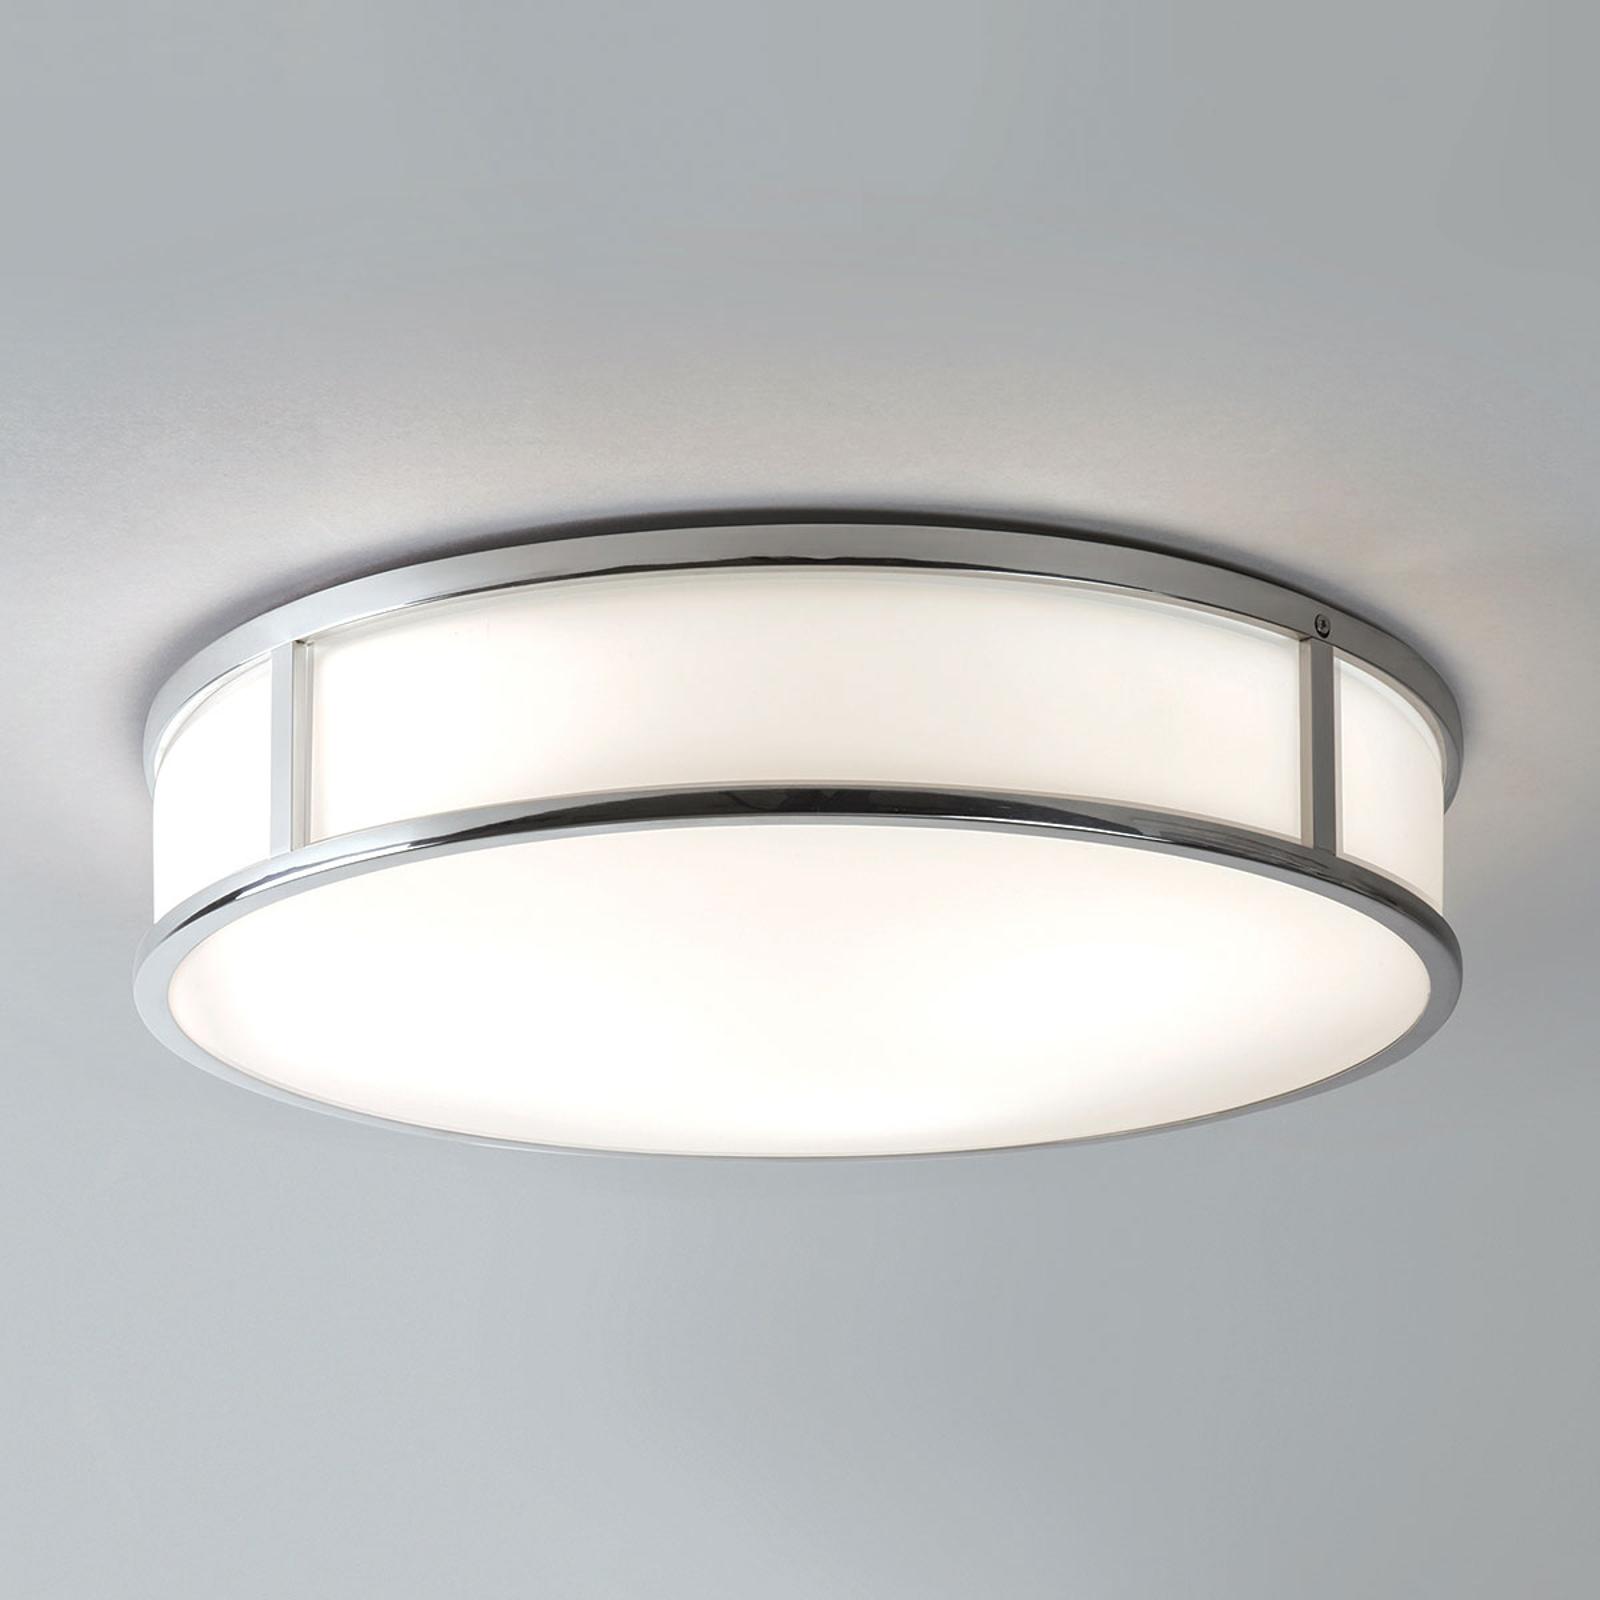 Astro Mashiko Round loftlampe Ø 40 cm krom